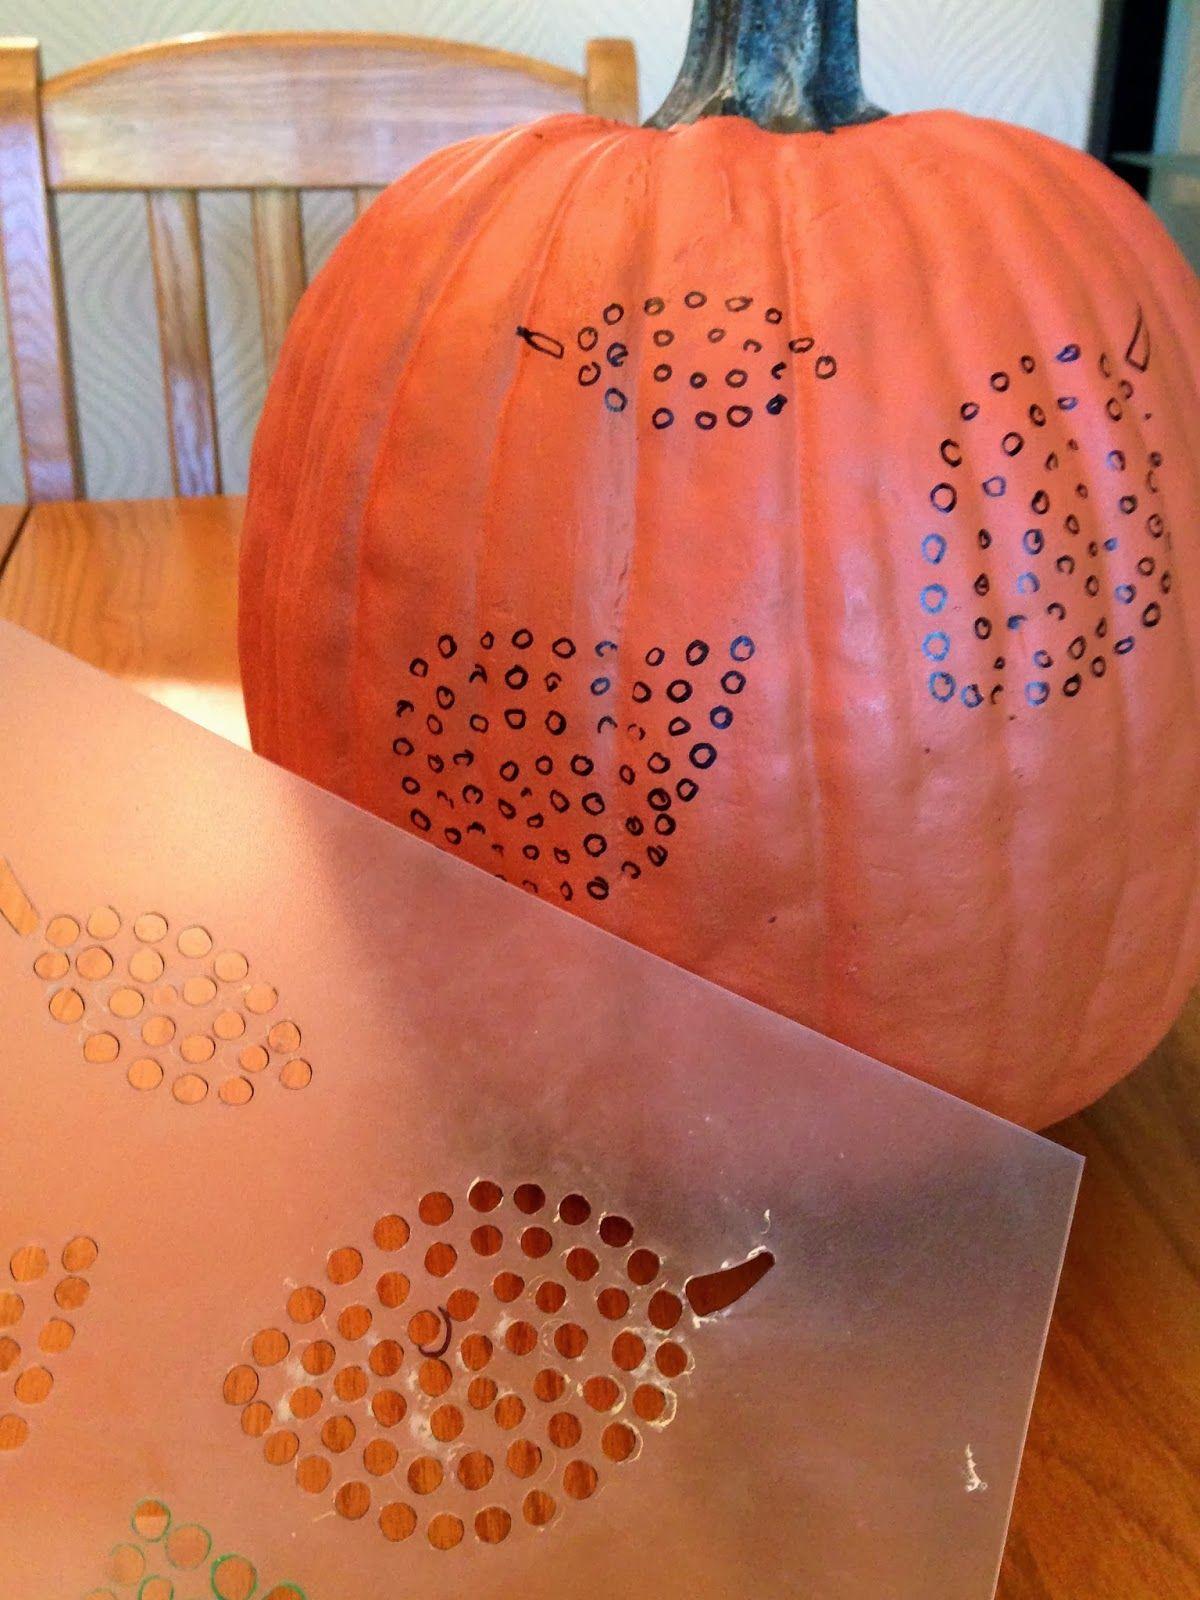 Carving Pumpkins With Power Tools Pumpkin Carving Pumpkin Carving